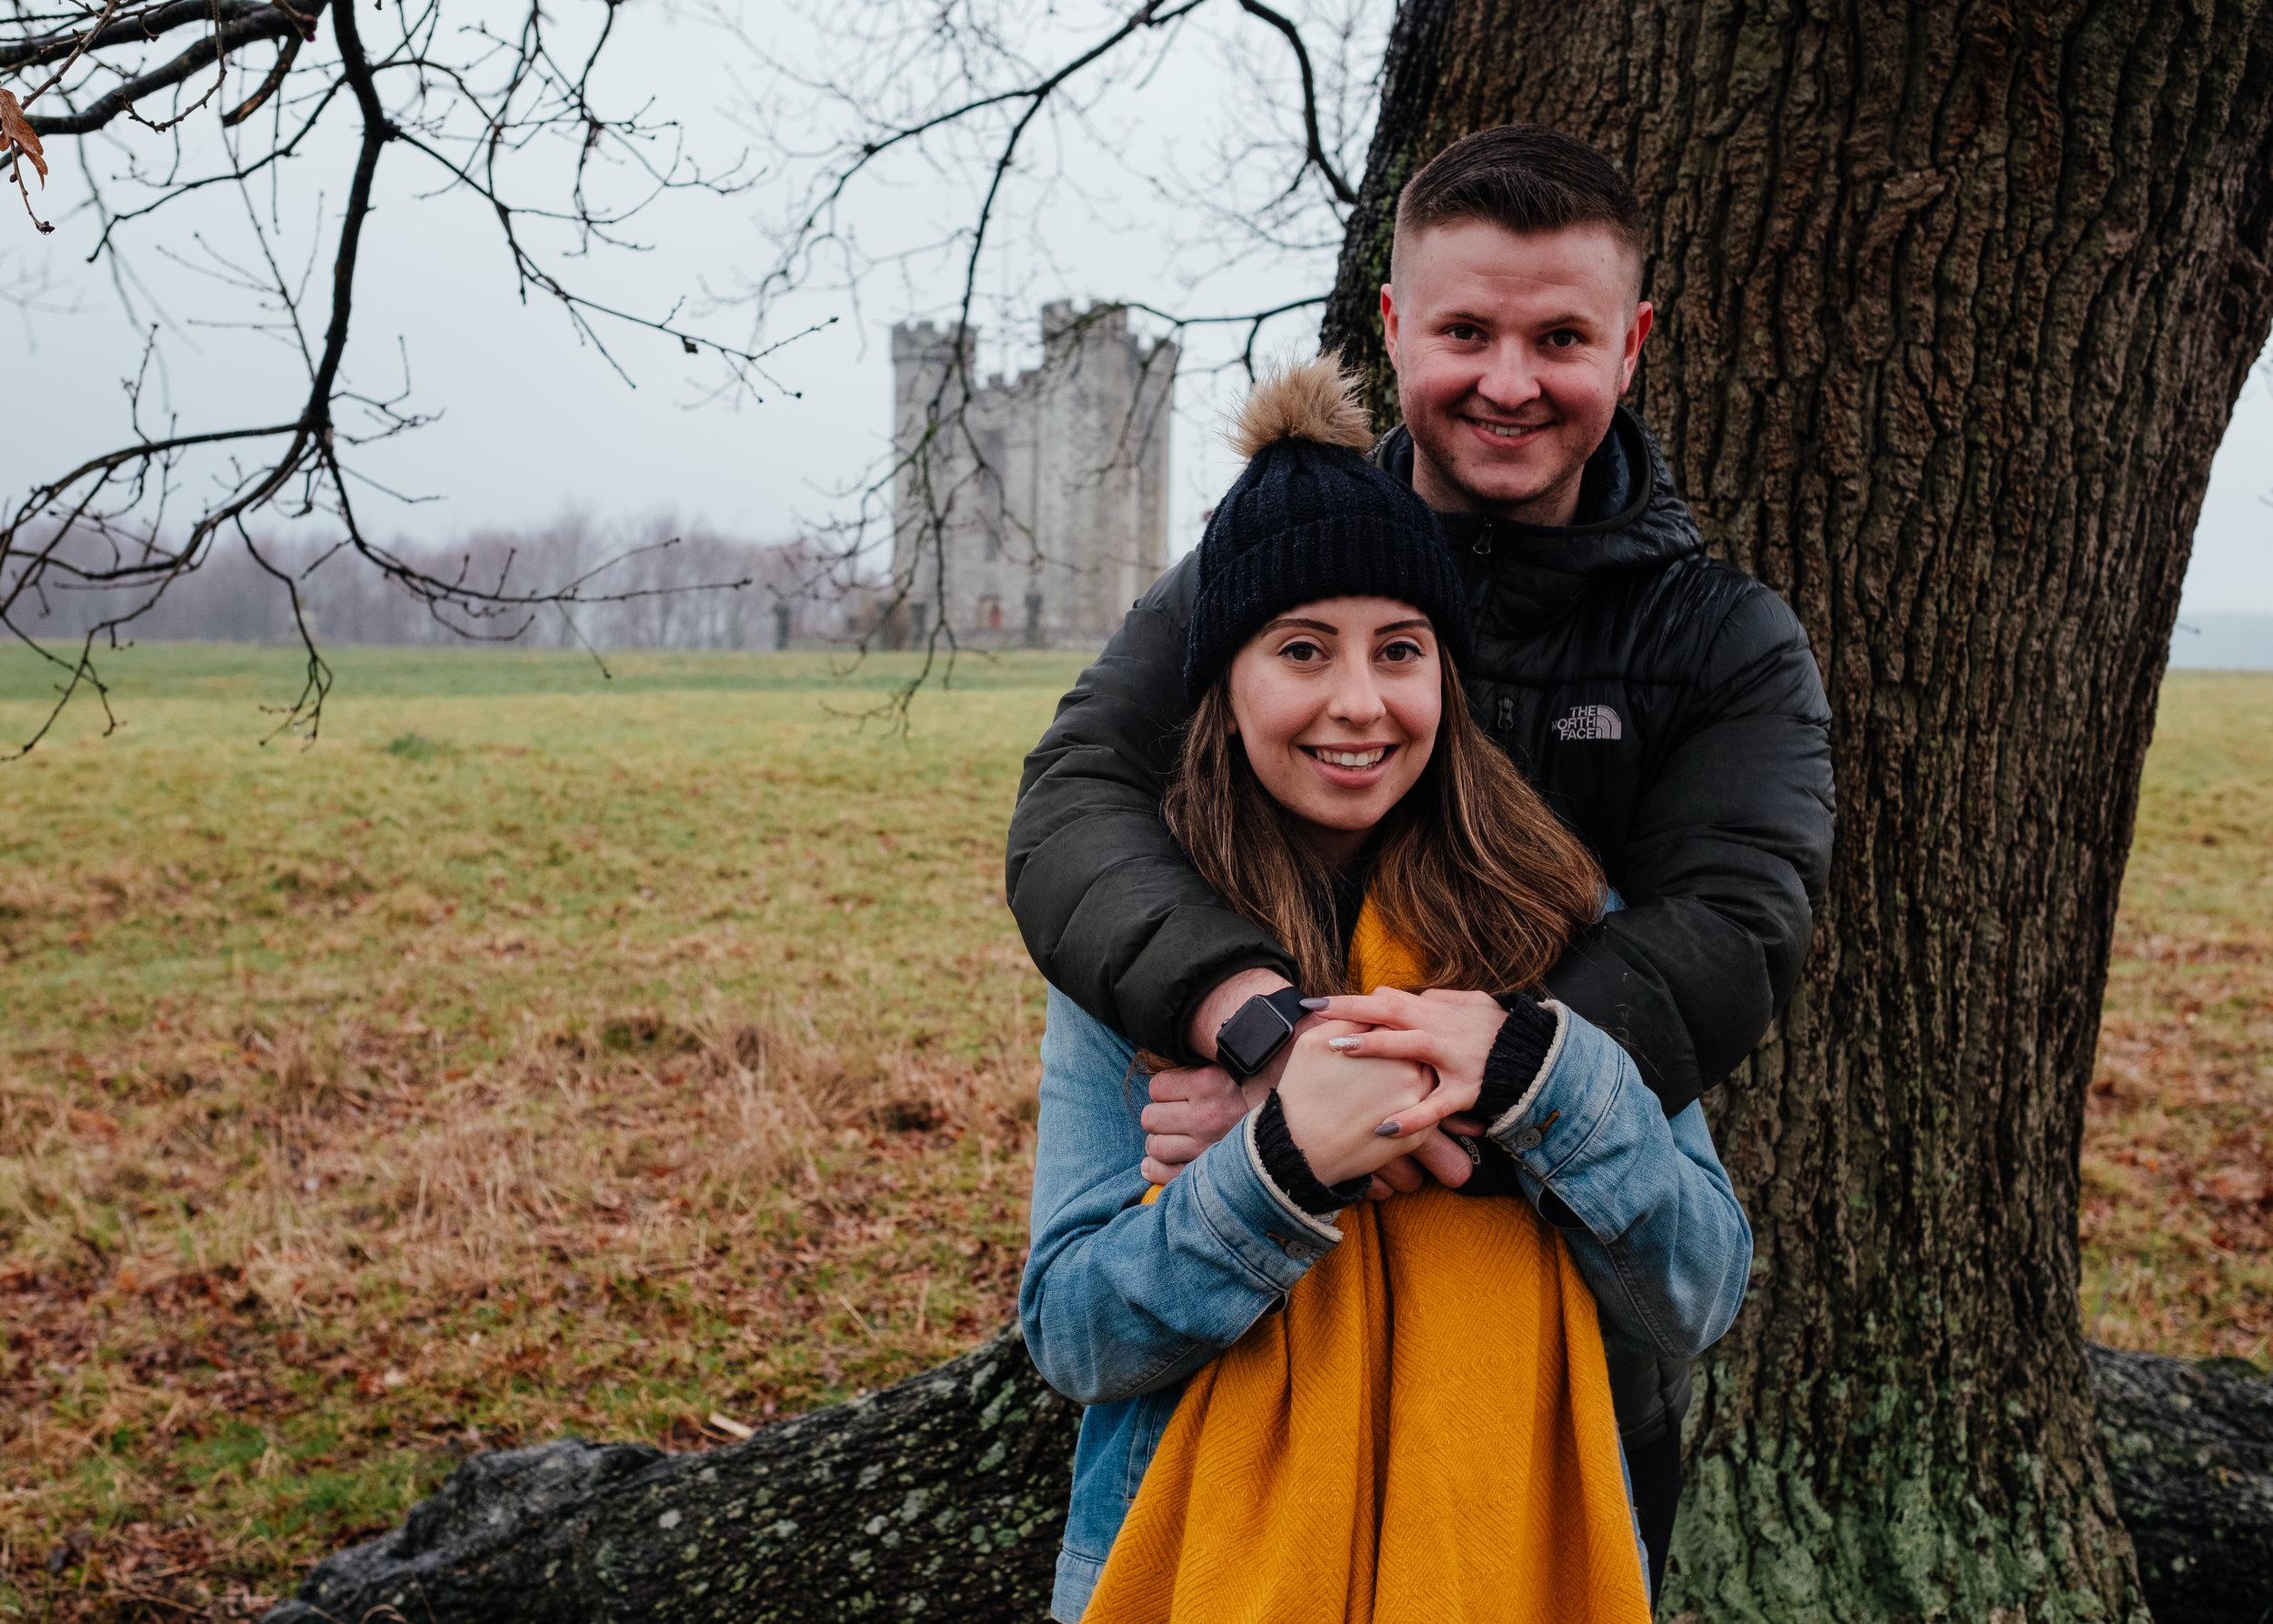 Arundel castle engagement